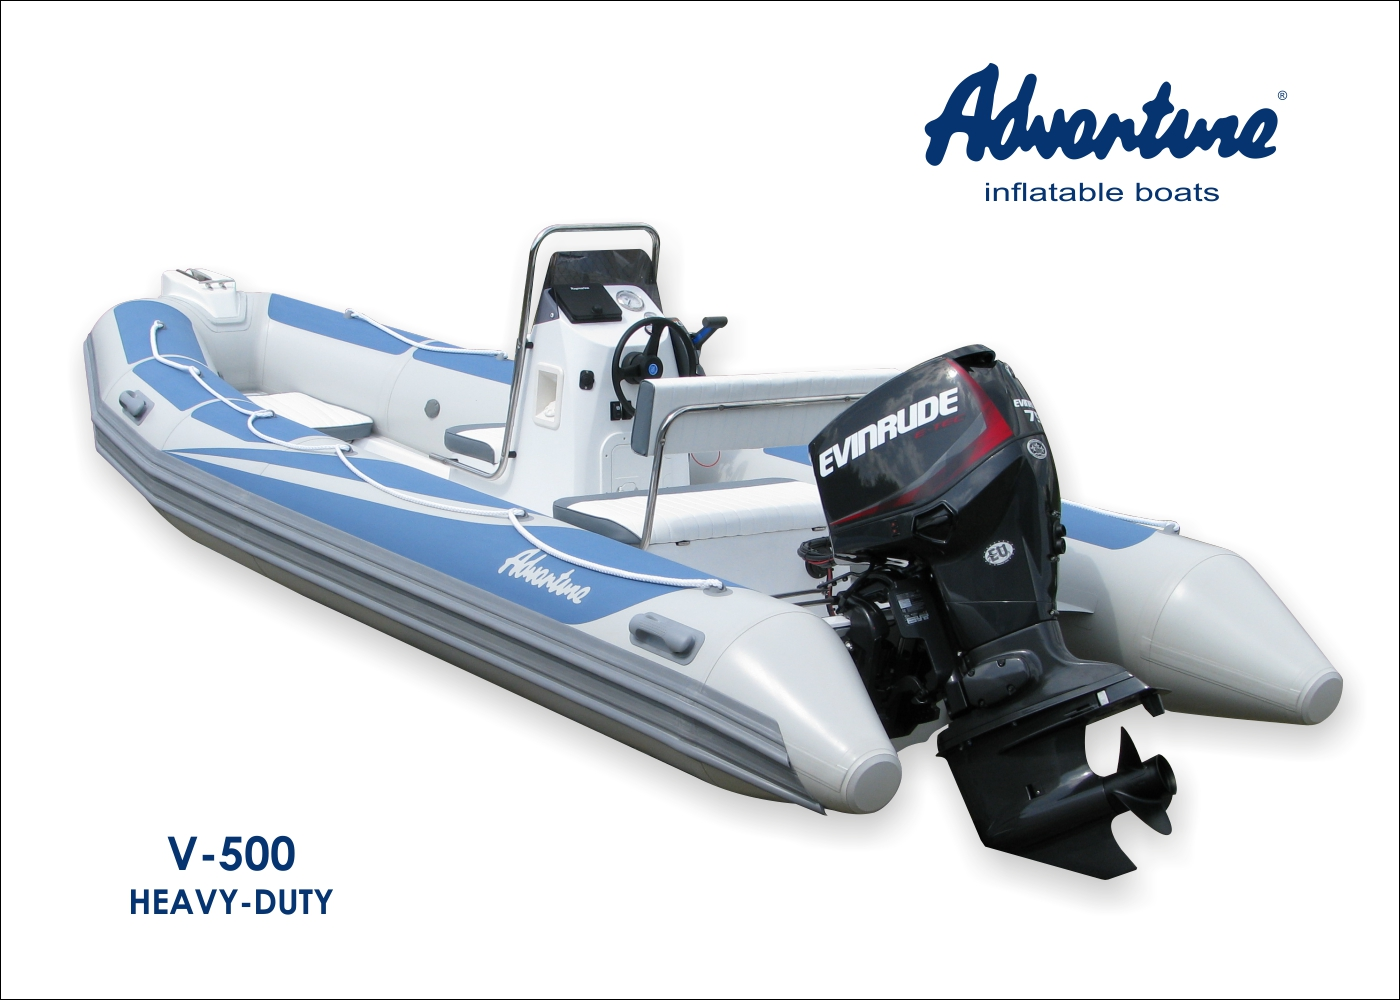 Zakázkové provedení člunu RIB Adventure V-500 HEAVY-DUTY s lodním motorem Evinrude E-TEC E75 DPGL